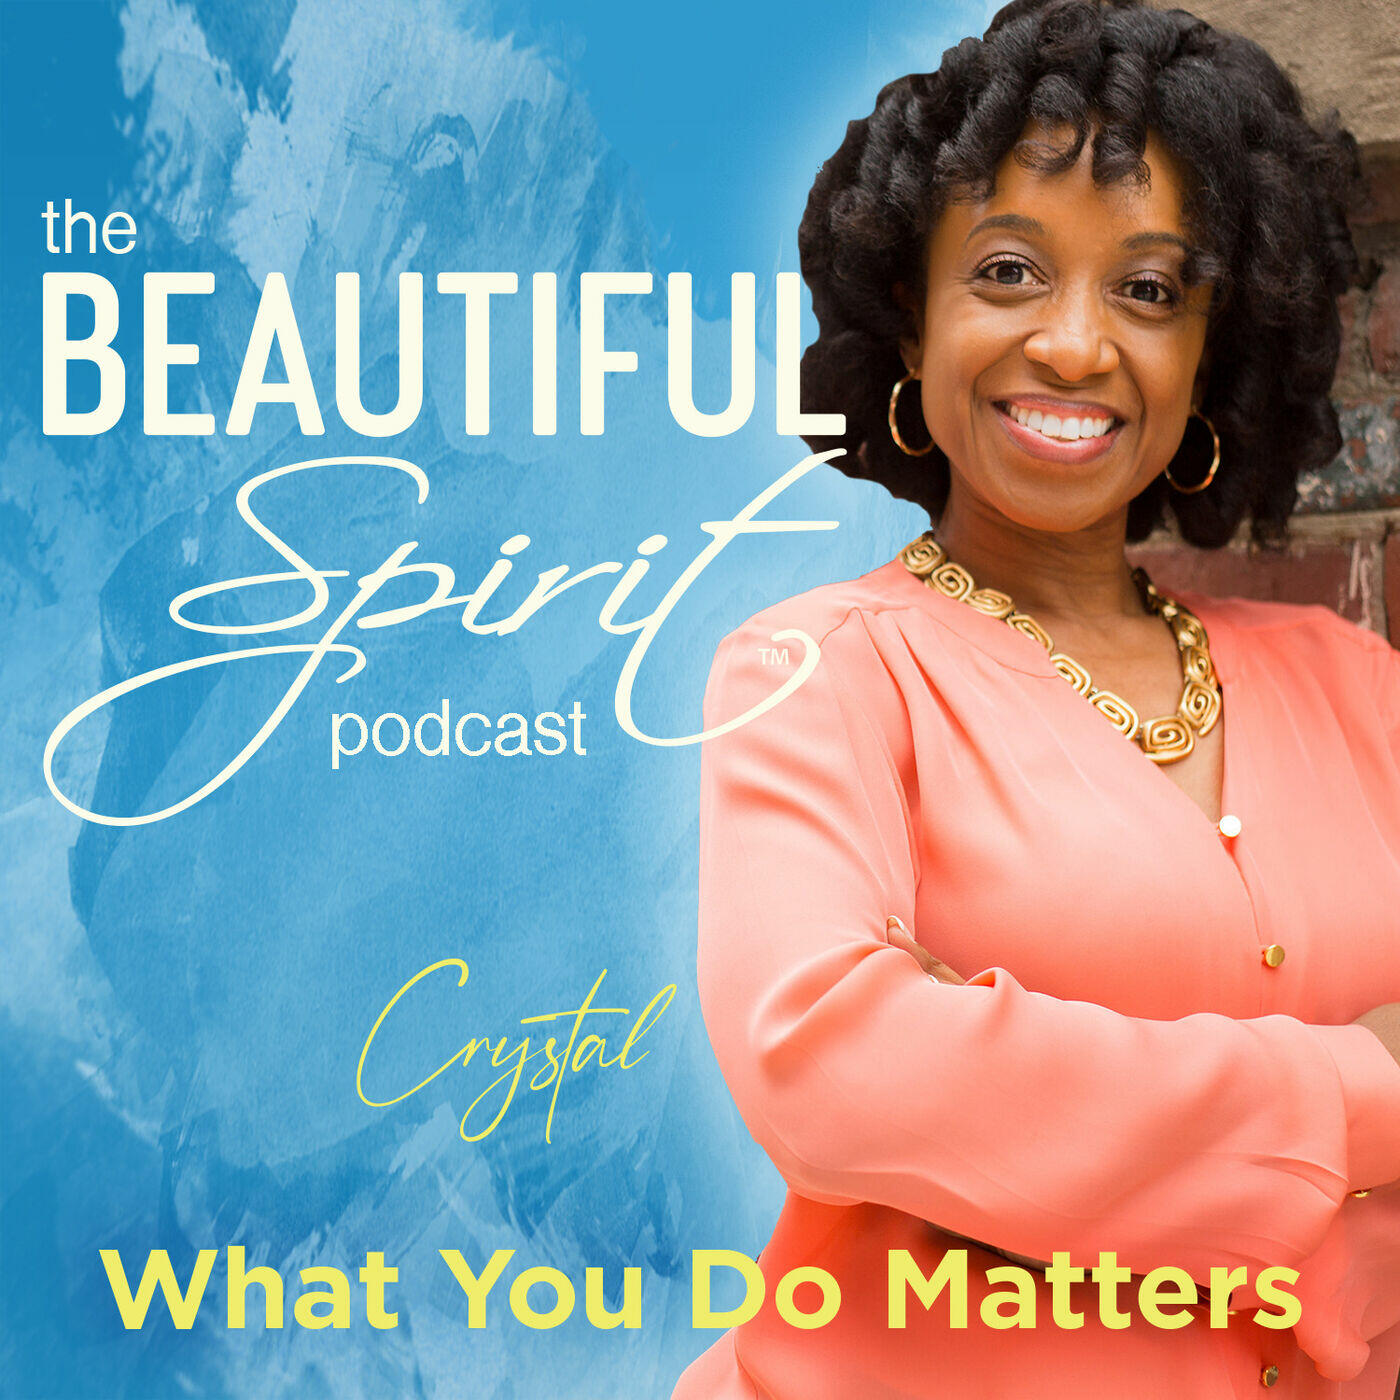 The Beautiful Spirit Podcast